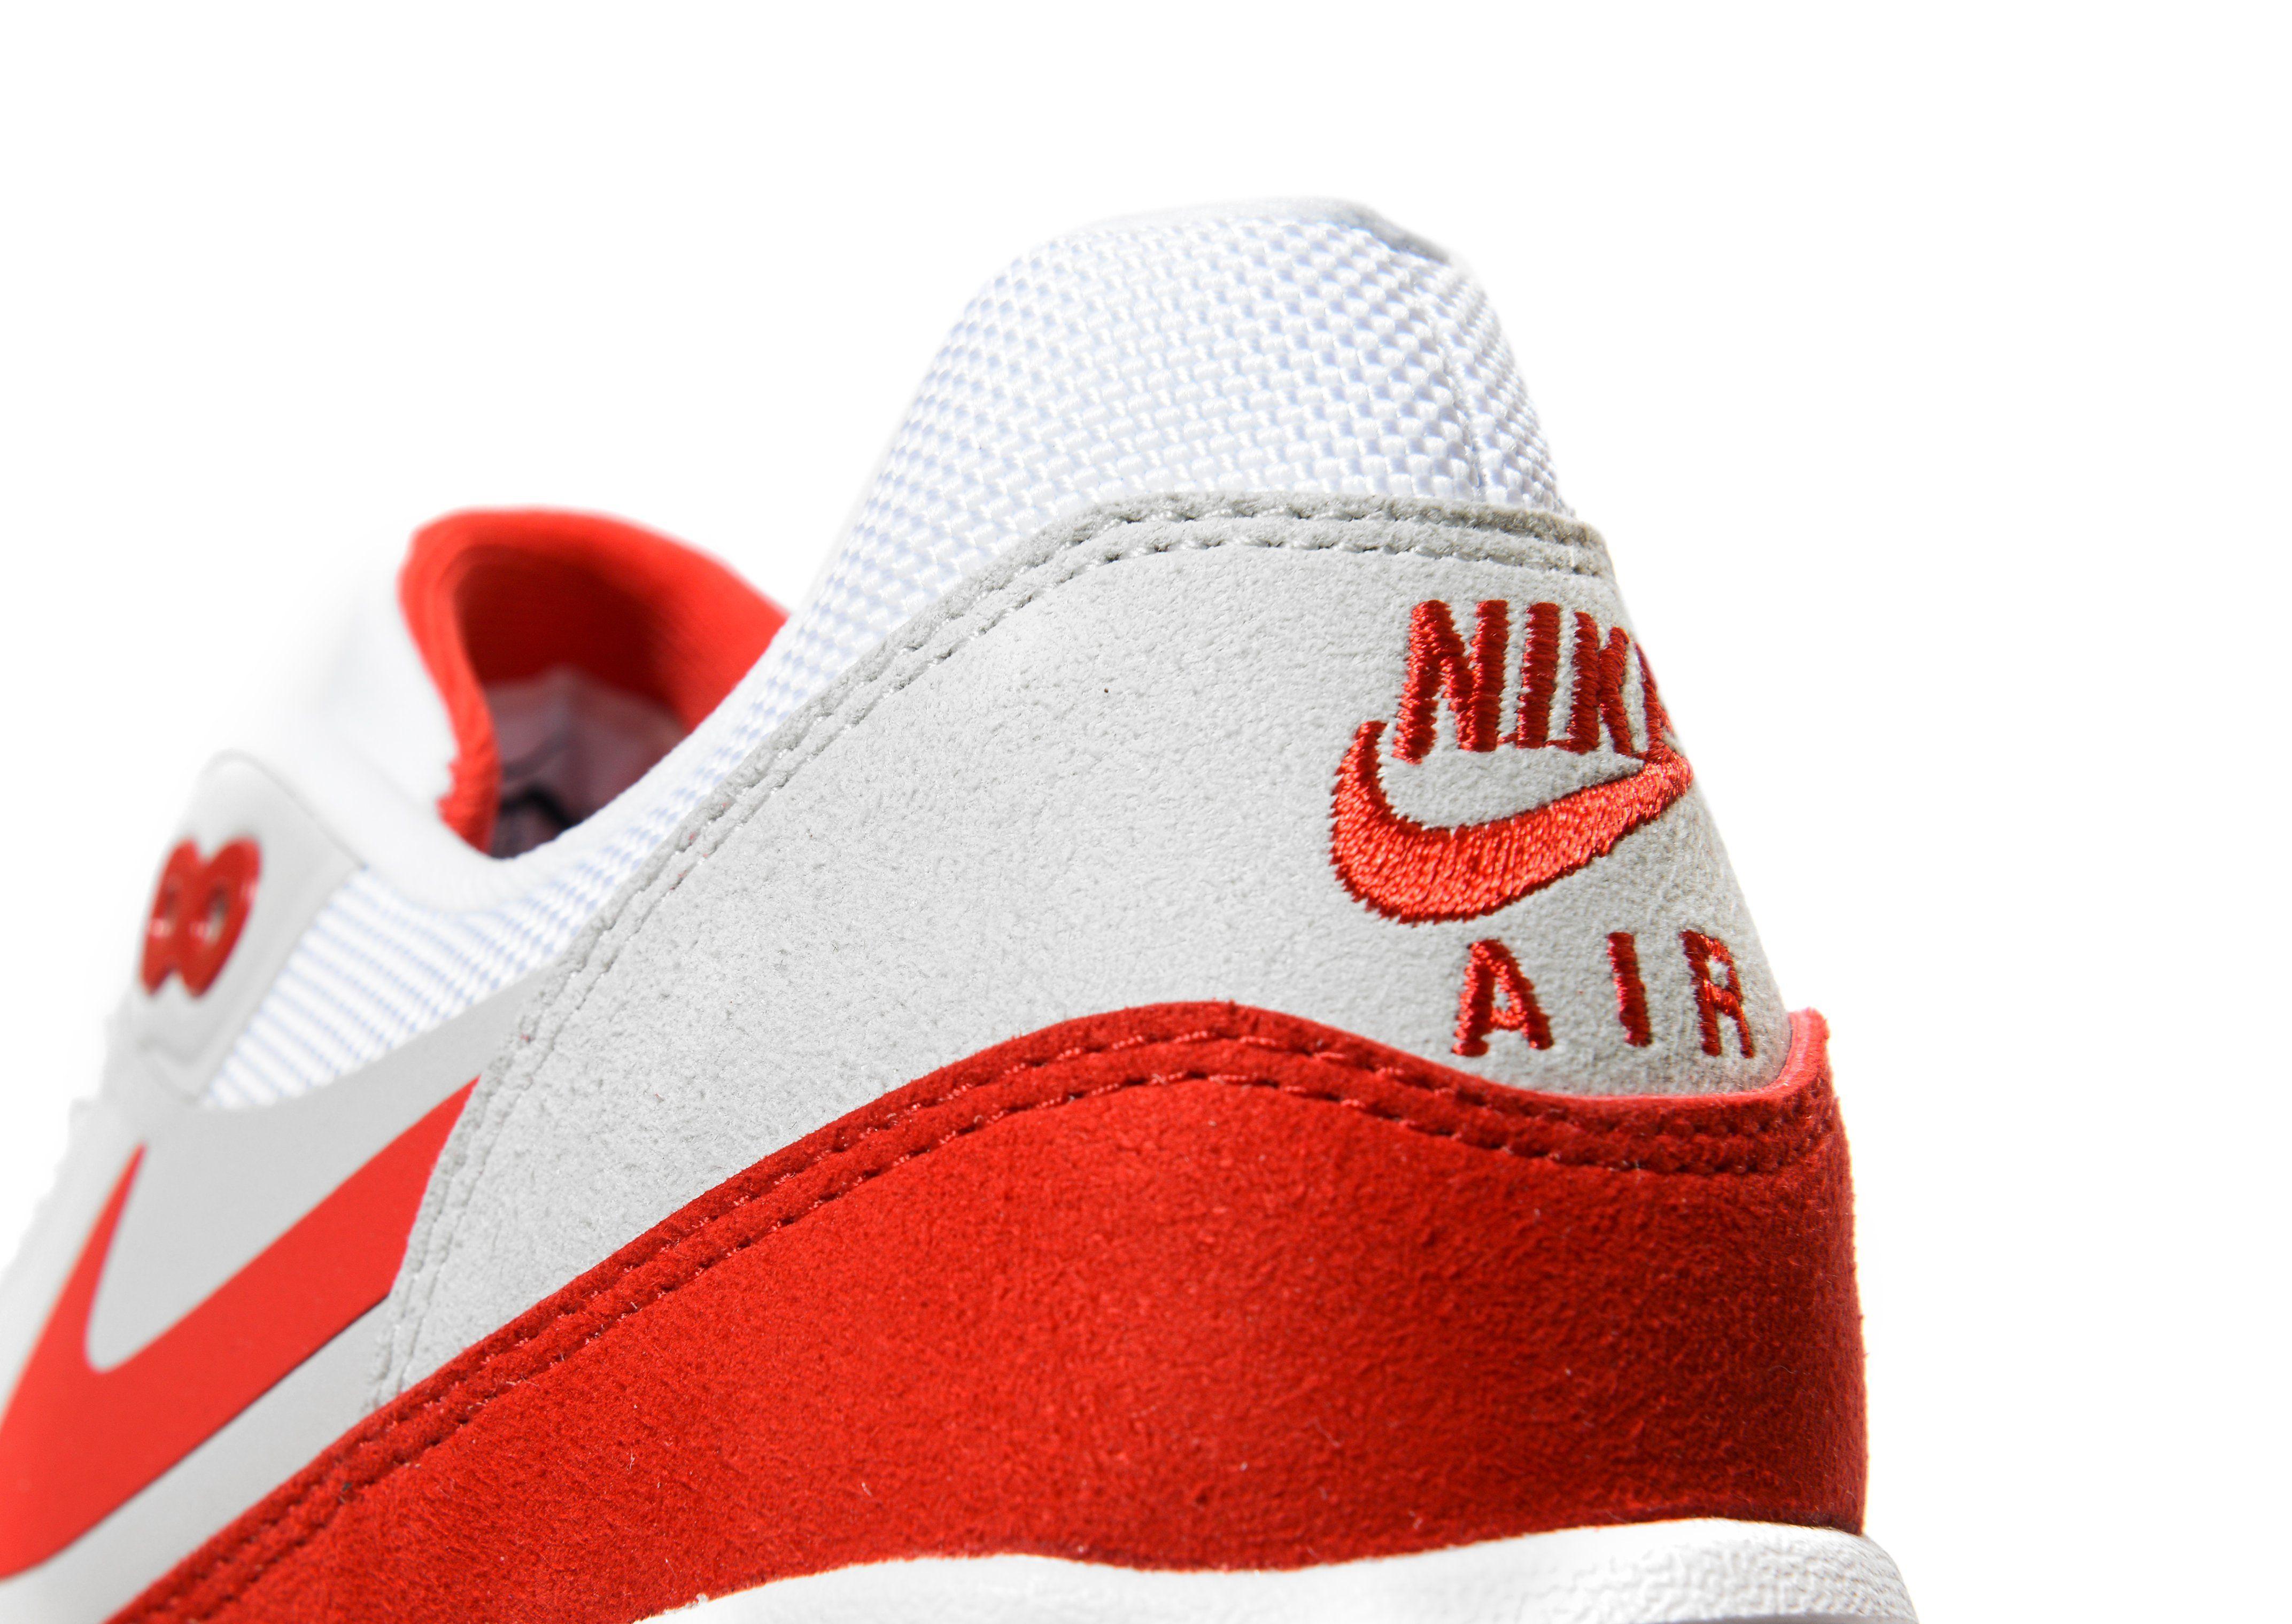 Nike Air Max 1 Ultra 2.0 'Anniversary' Women's